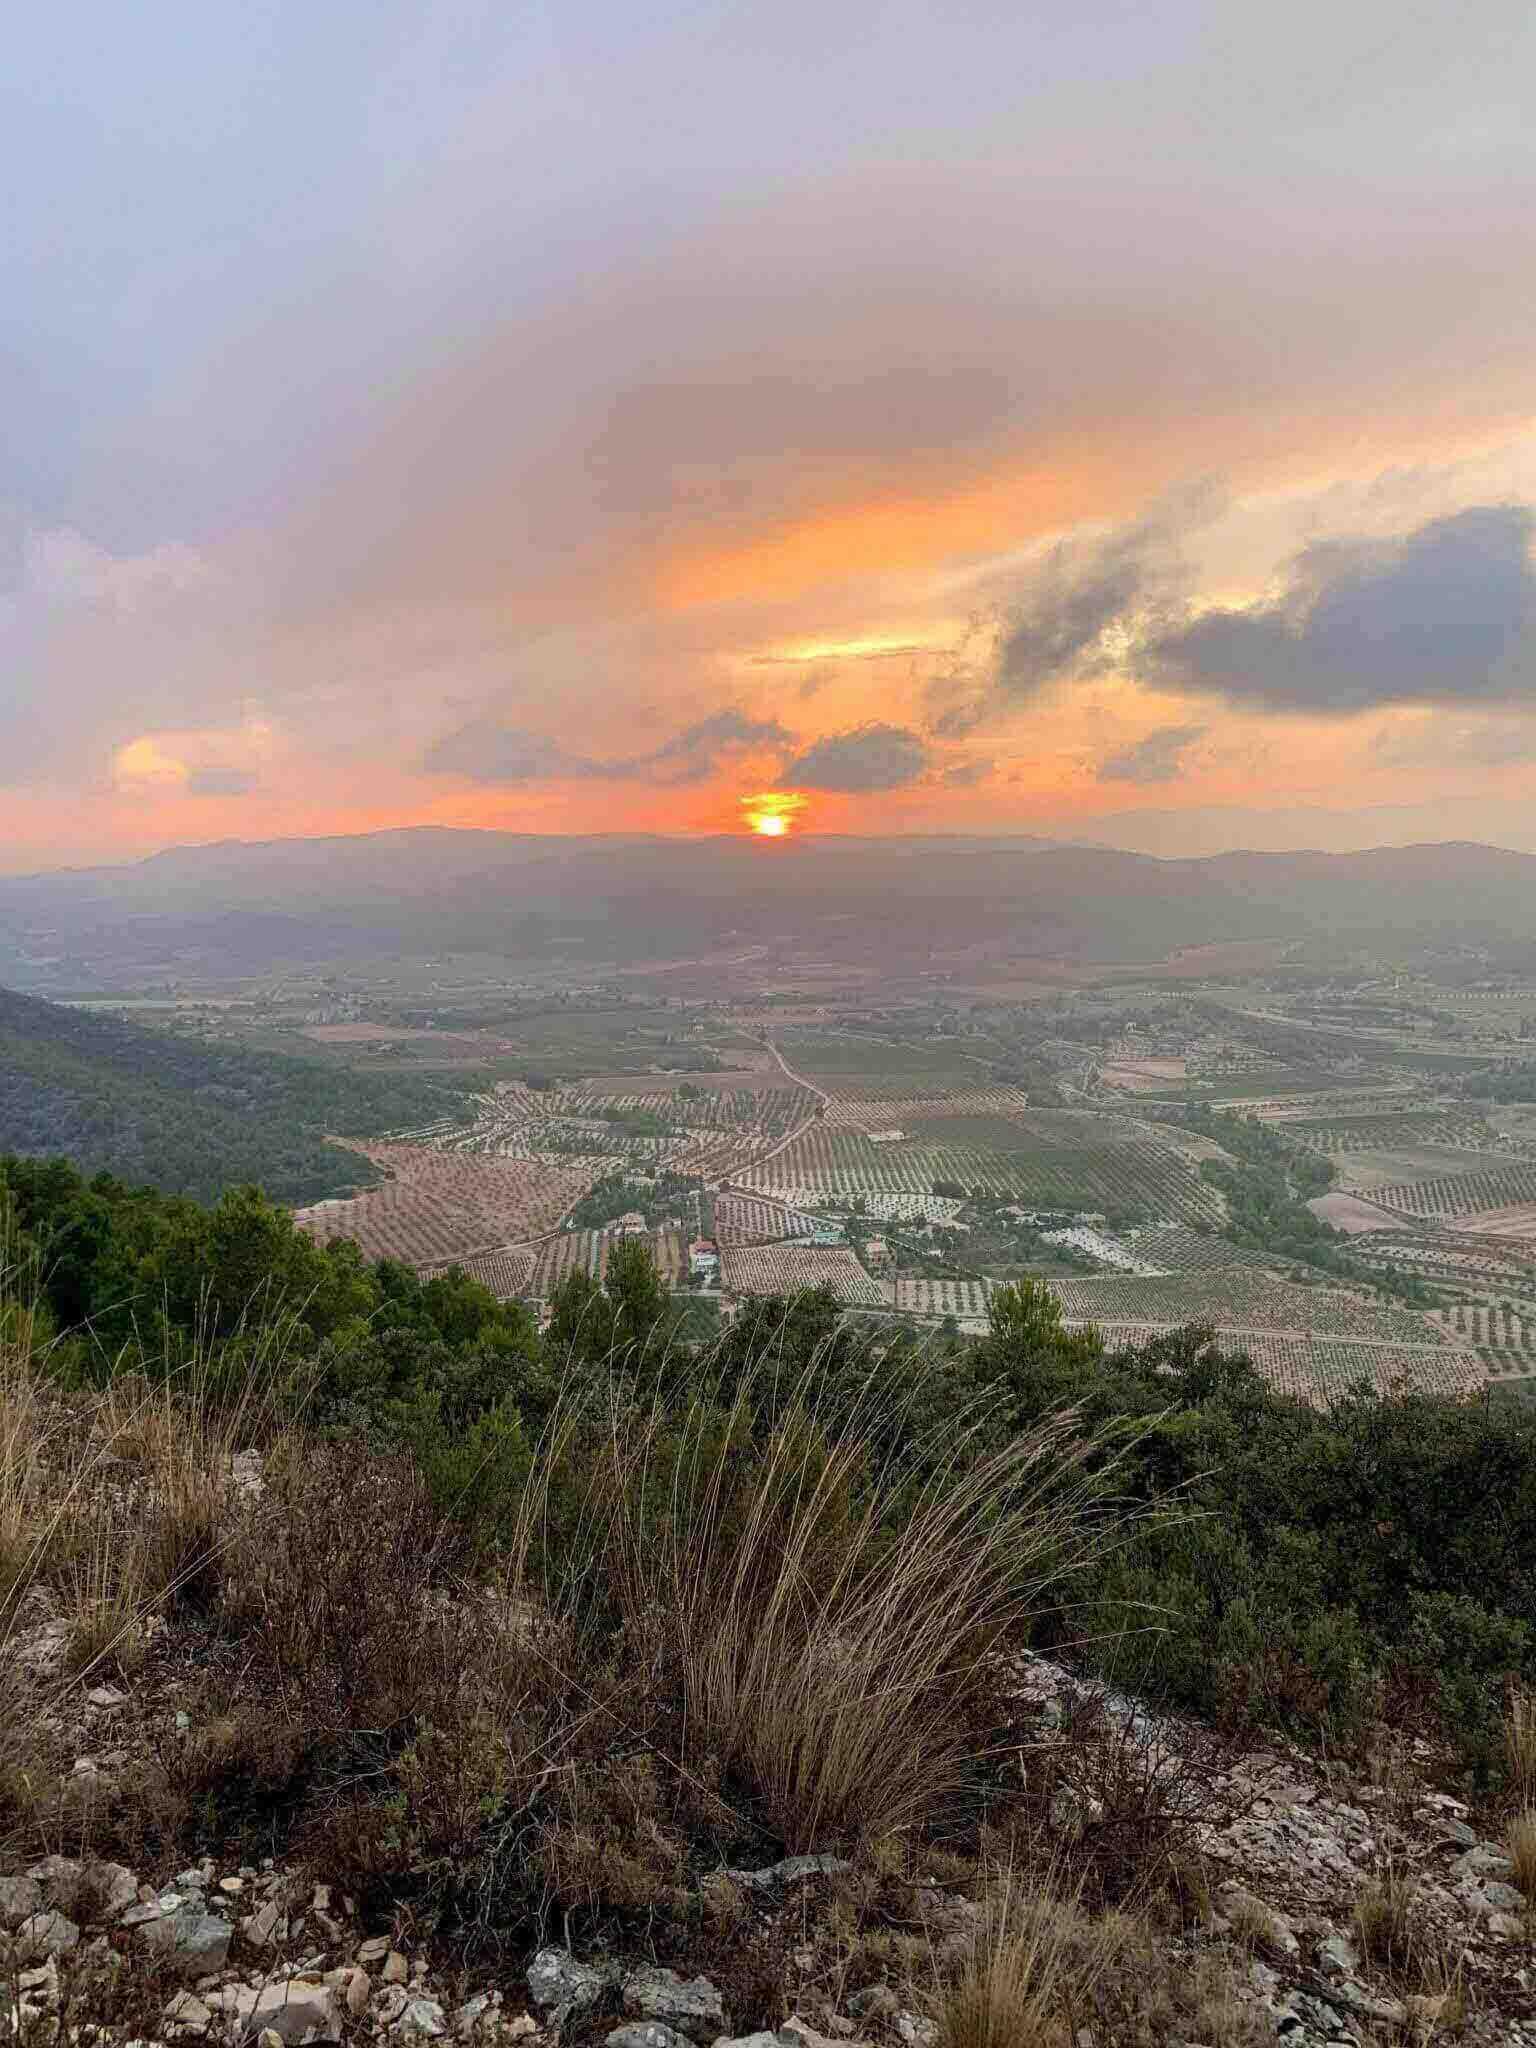 Sierra del Castellar en Bullas (Murcia). Vista desde arriba.